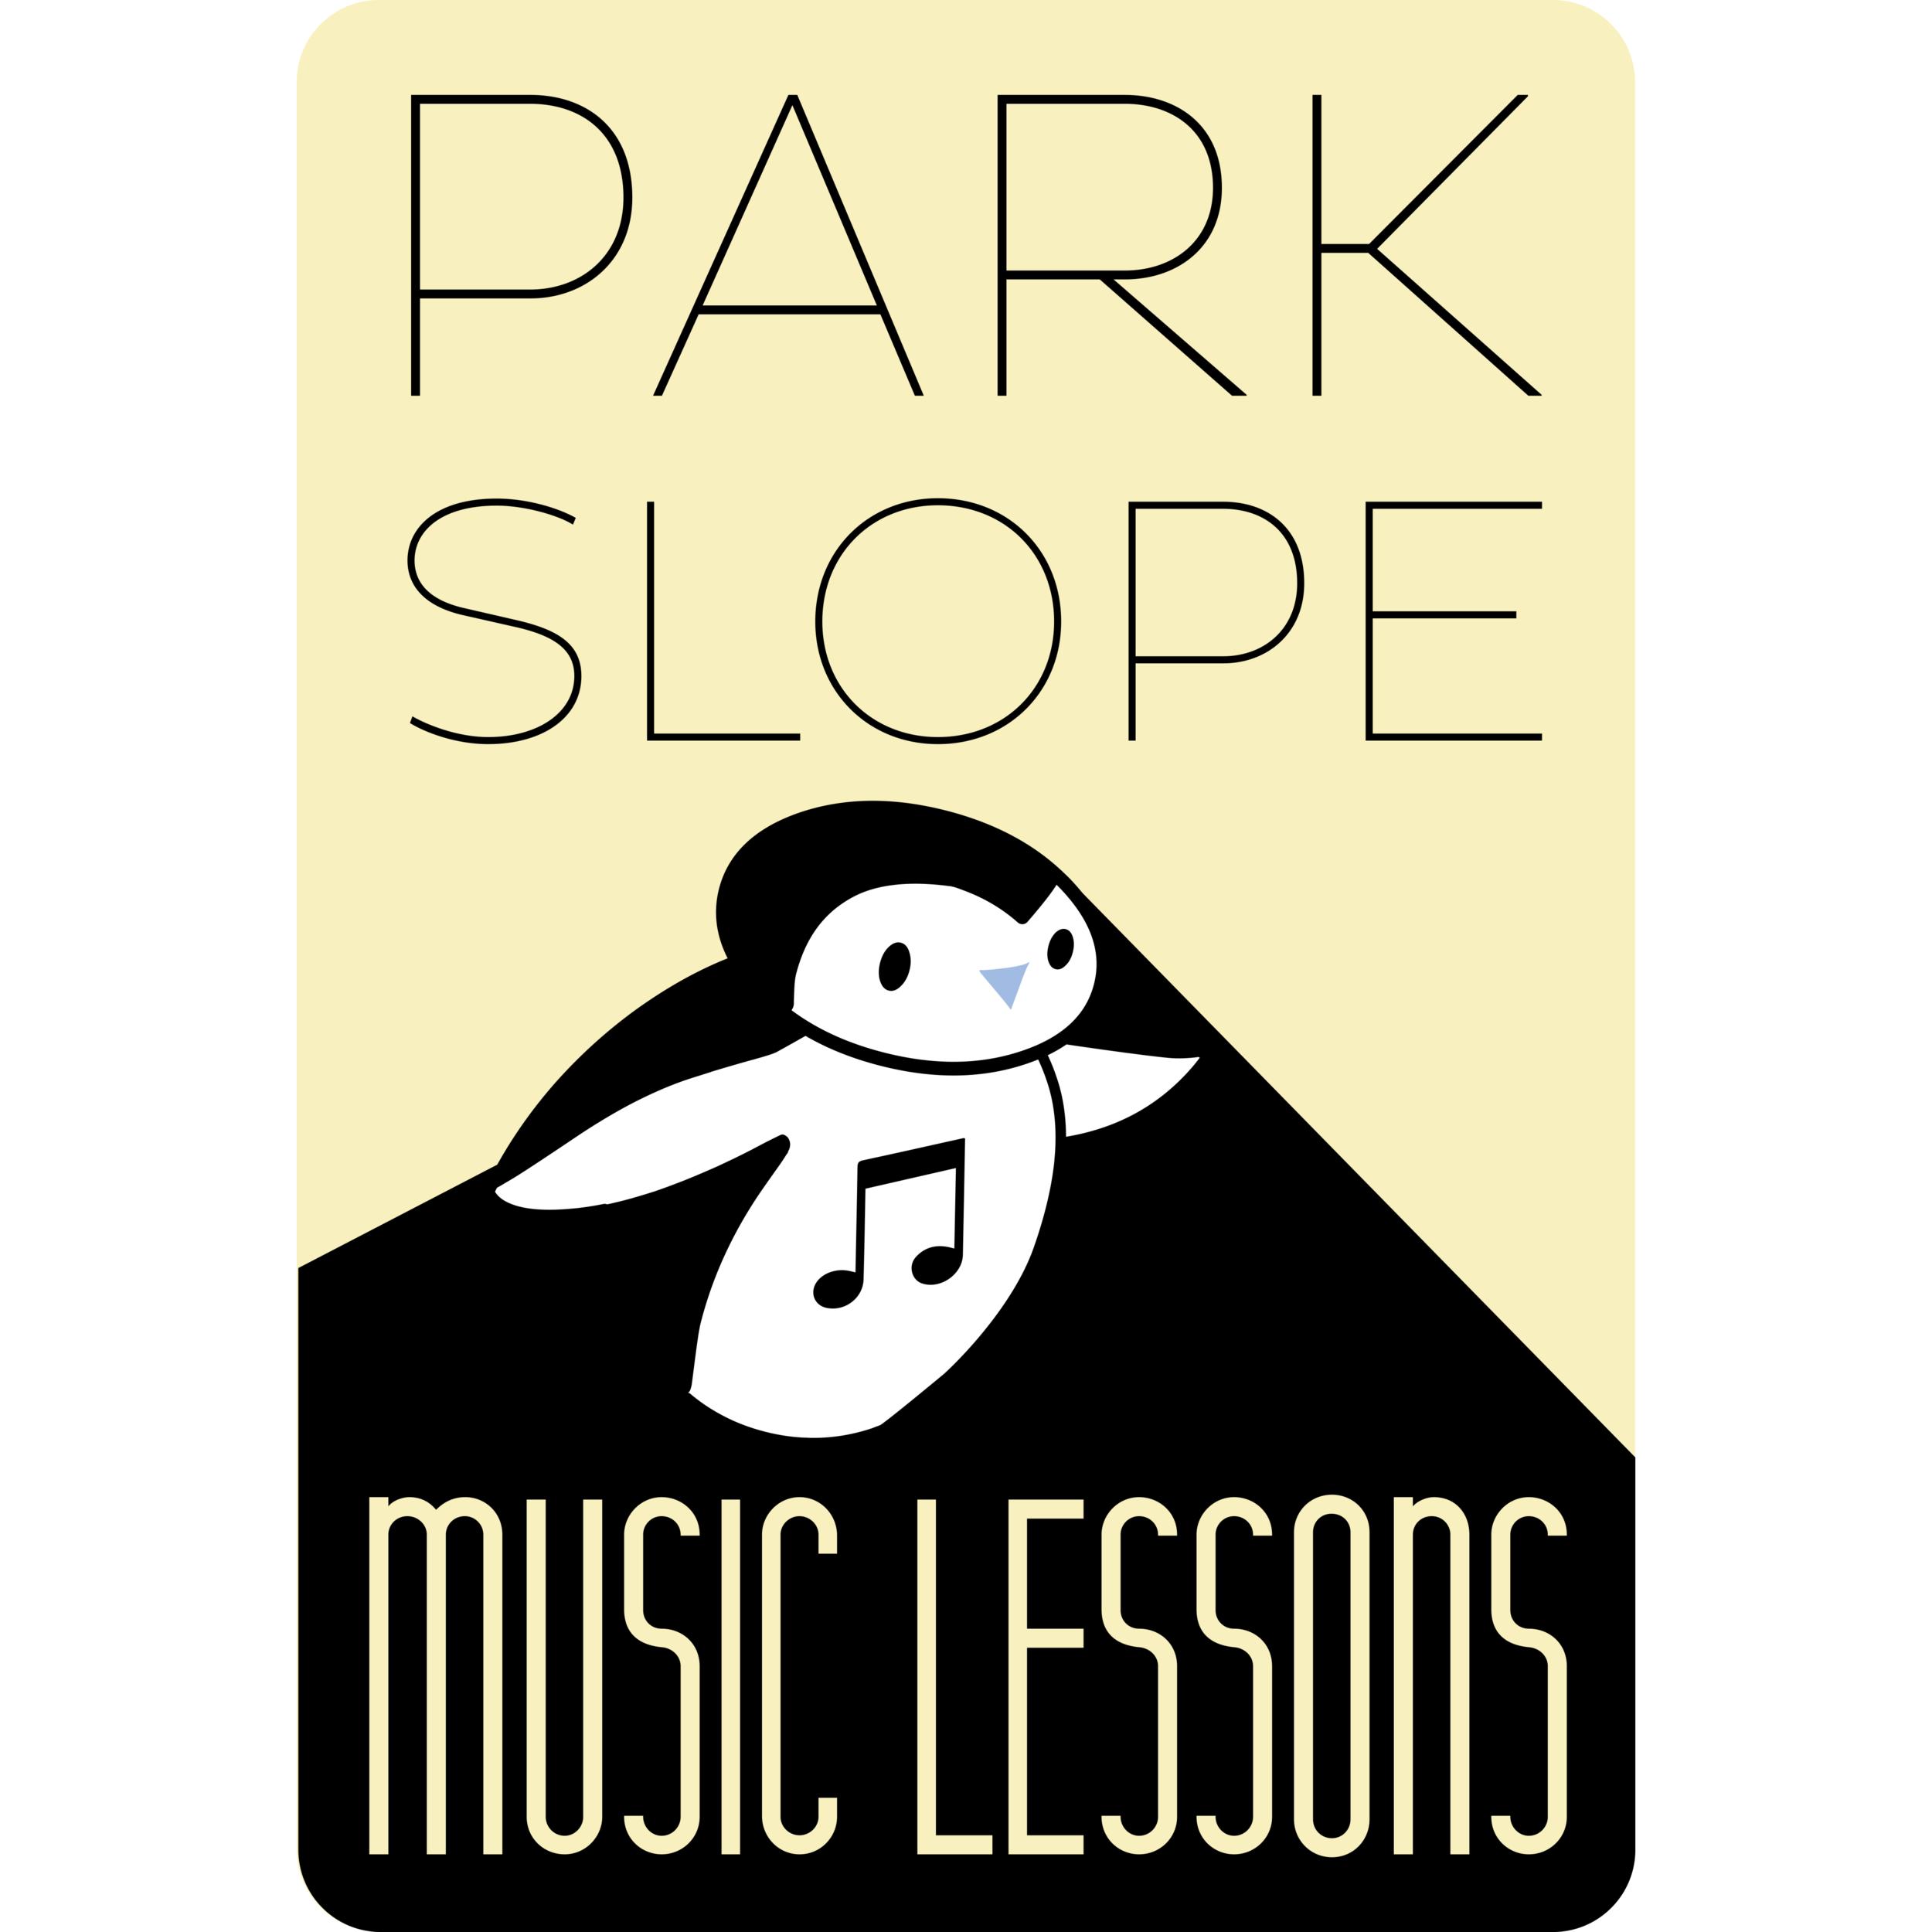 Park Slope Music Lessons